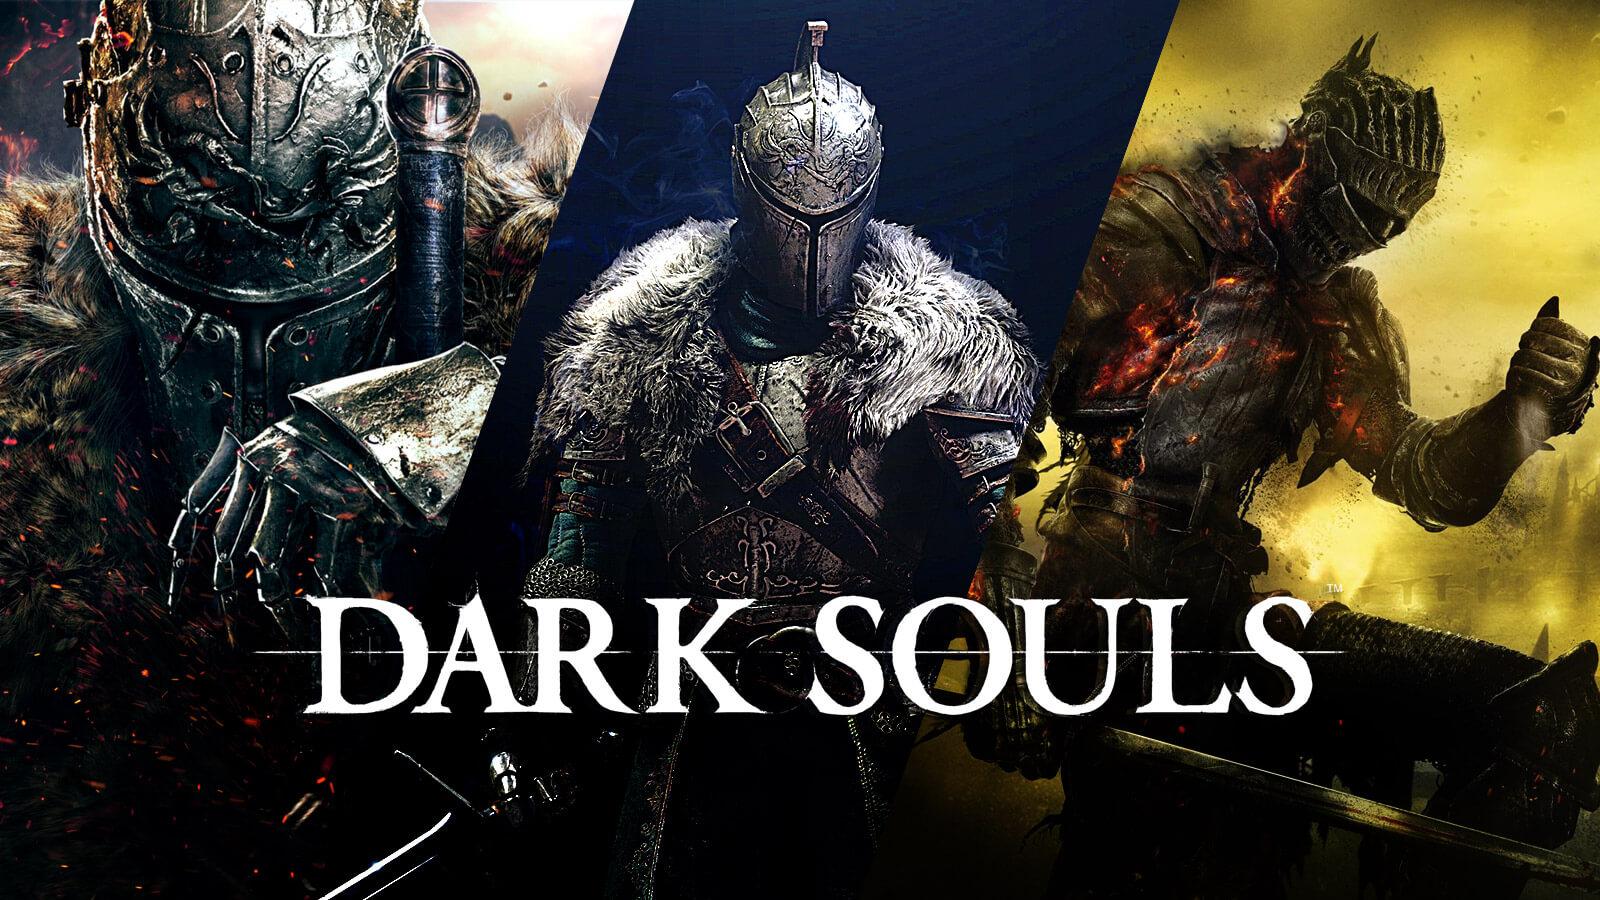 Dark Souls Series Hits 27 Million Sales, Dark Souls 3 Sold 10 Million